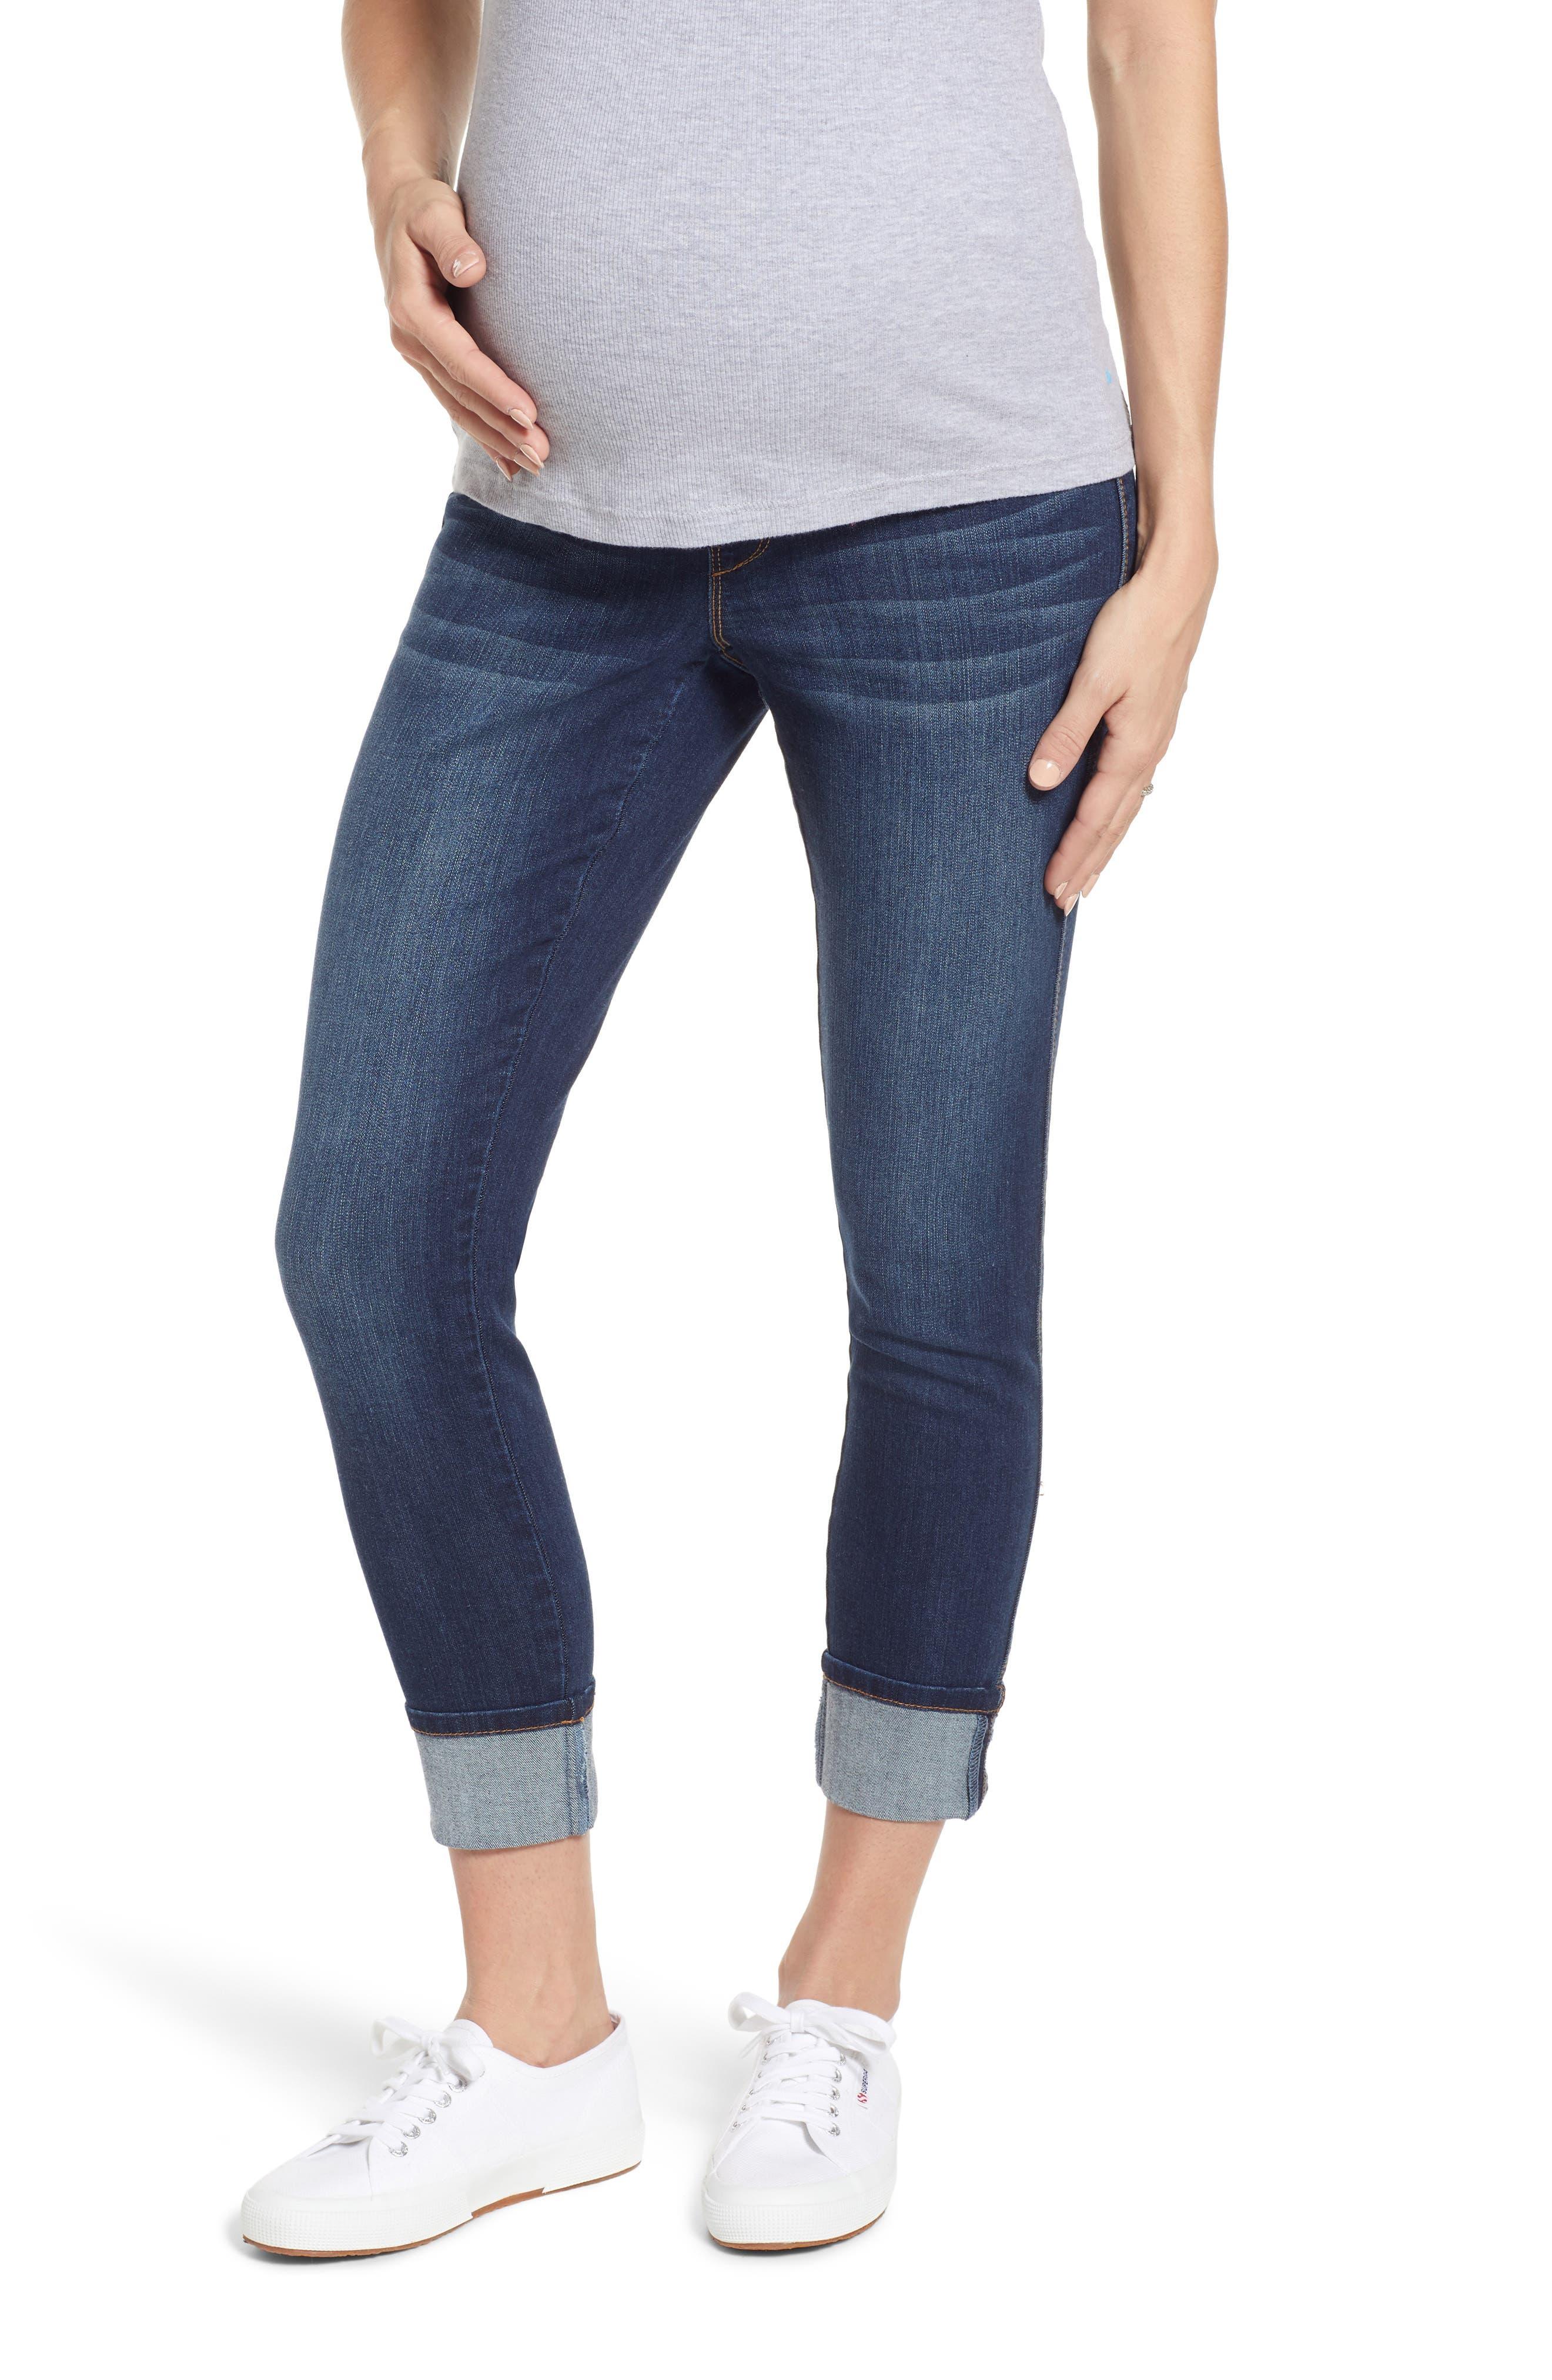 Women's 1822 Denim Clean Cuff Skinny Maternity Jeans